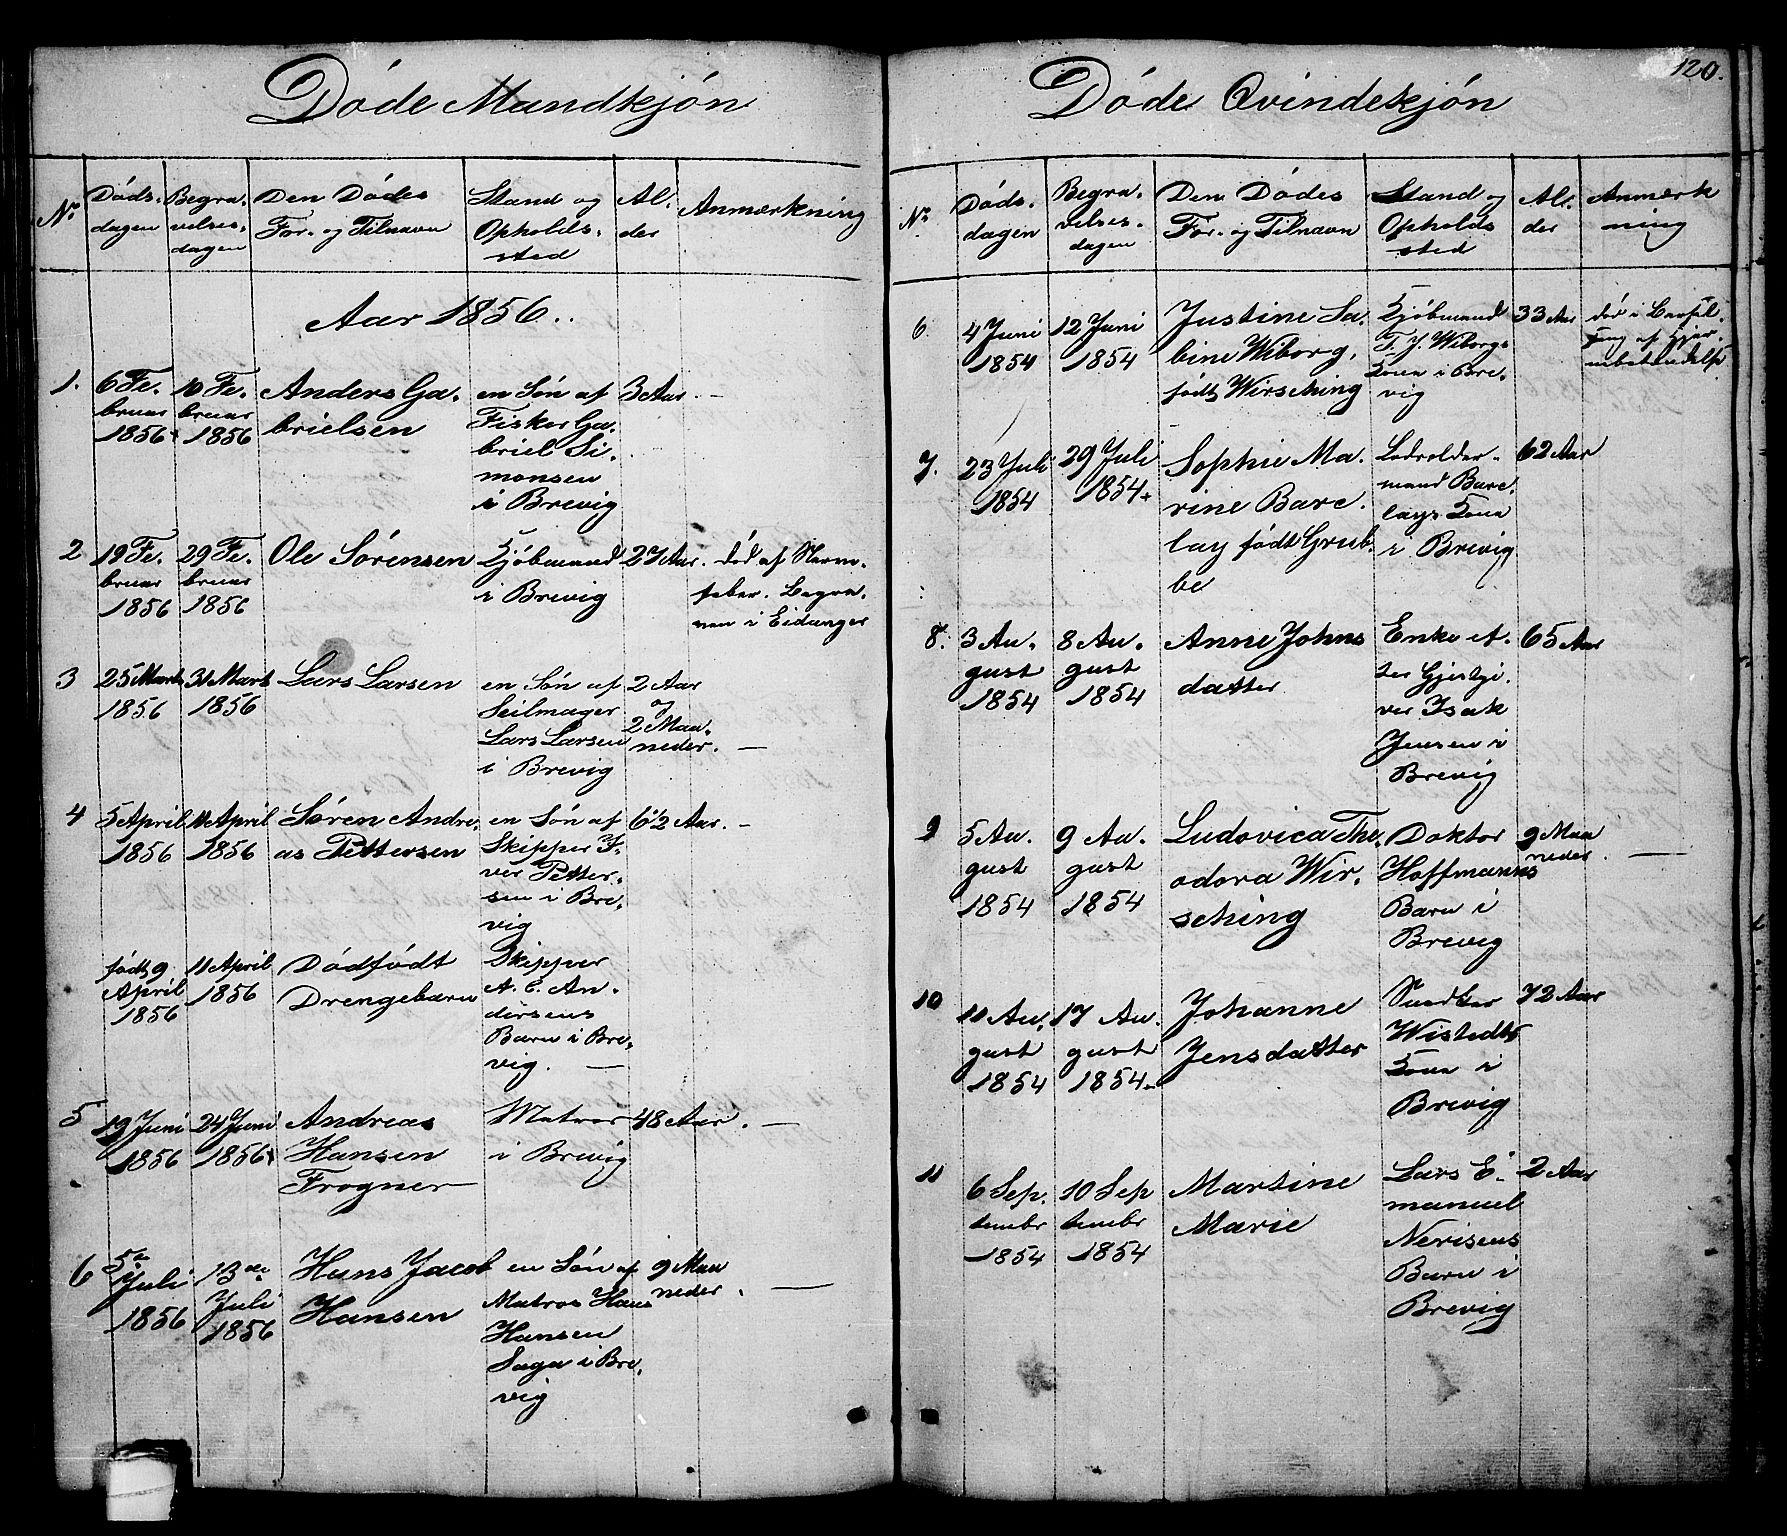 SAKO, Brevik kirkebøker, G/Ga/L0002: Klokkerbok nr. 2, 1846-1865, s. 120